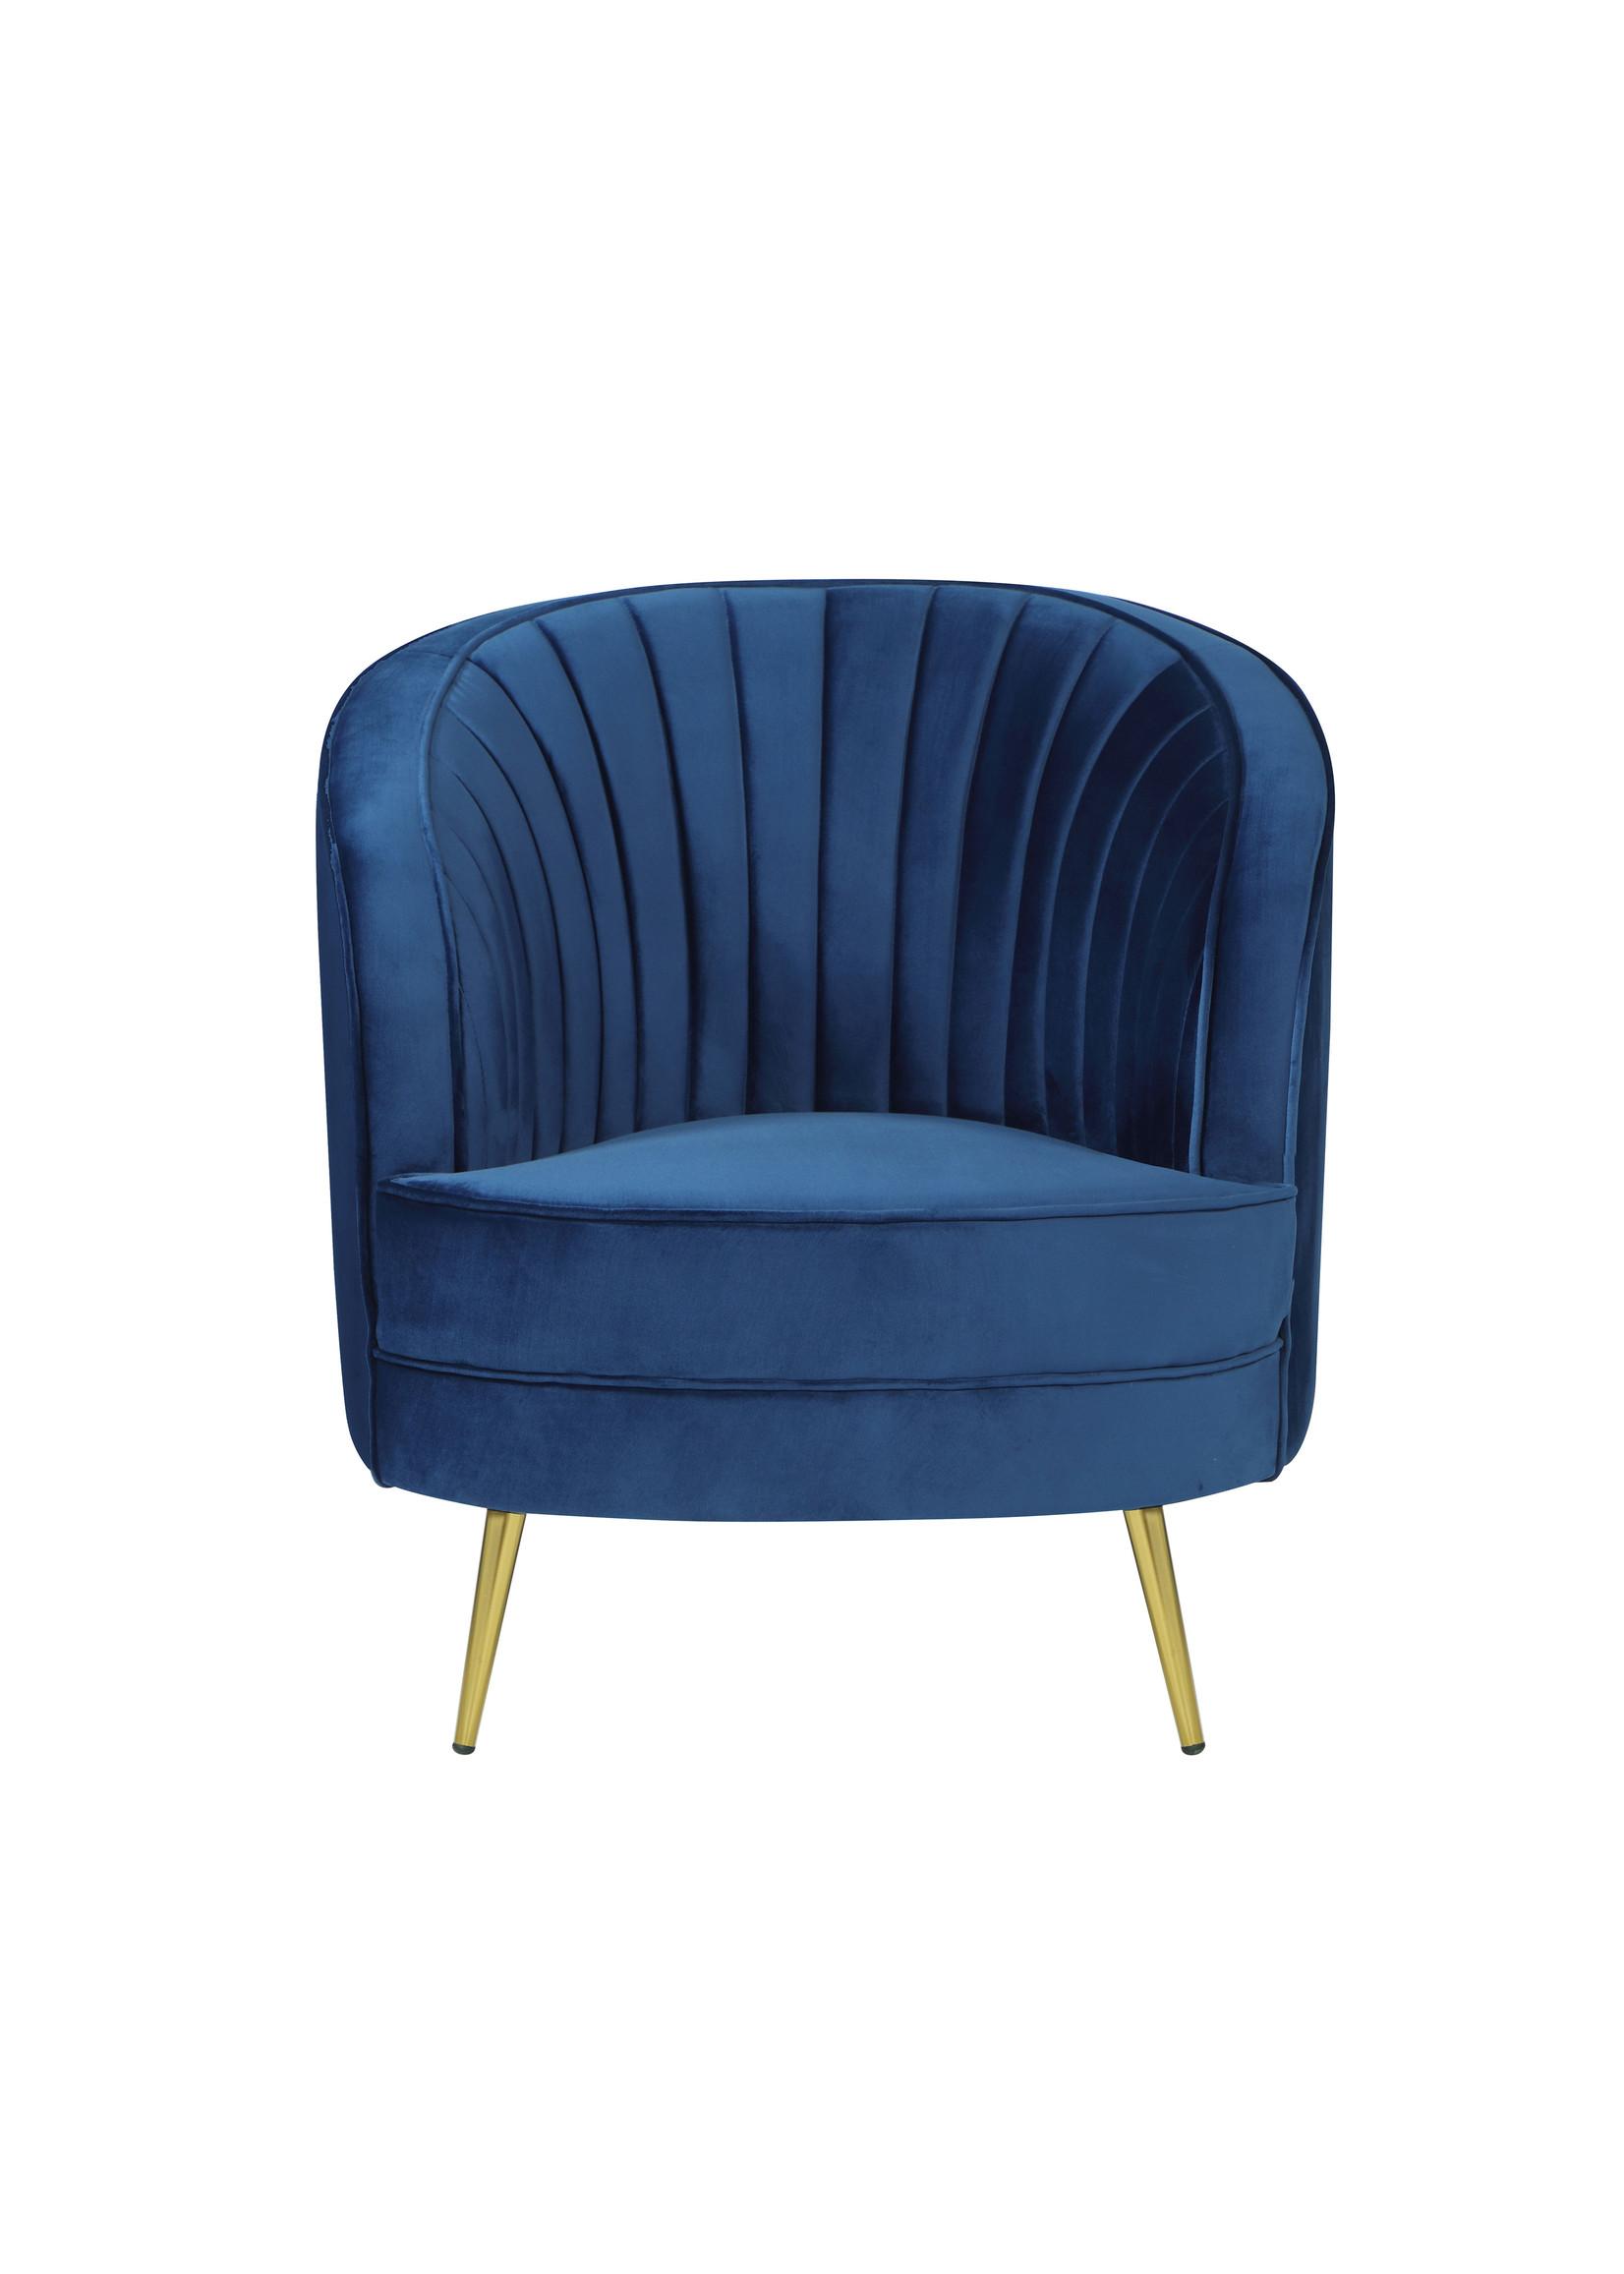 Coaster Furniture Sophia Chair Blue Velvet by Coaster